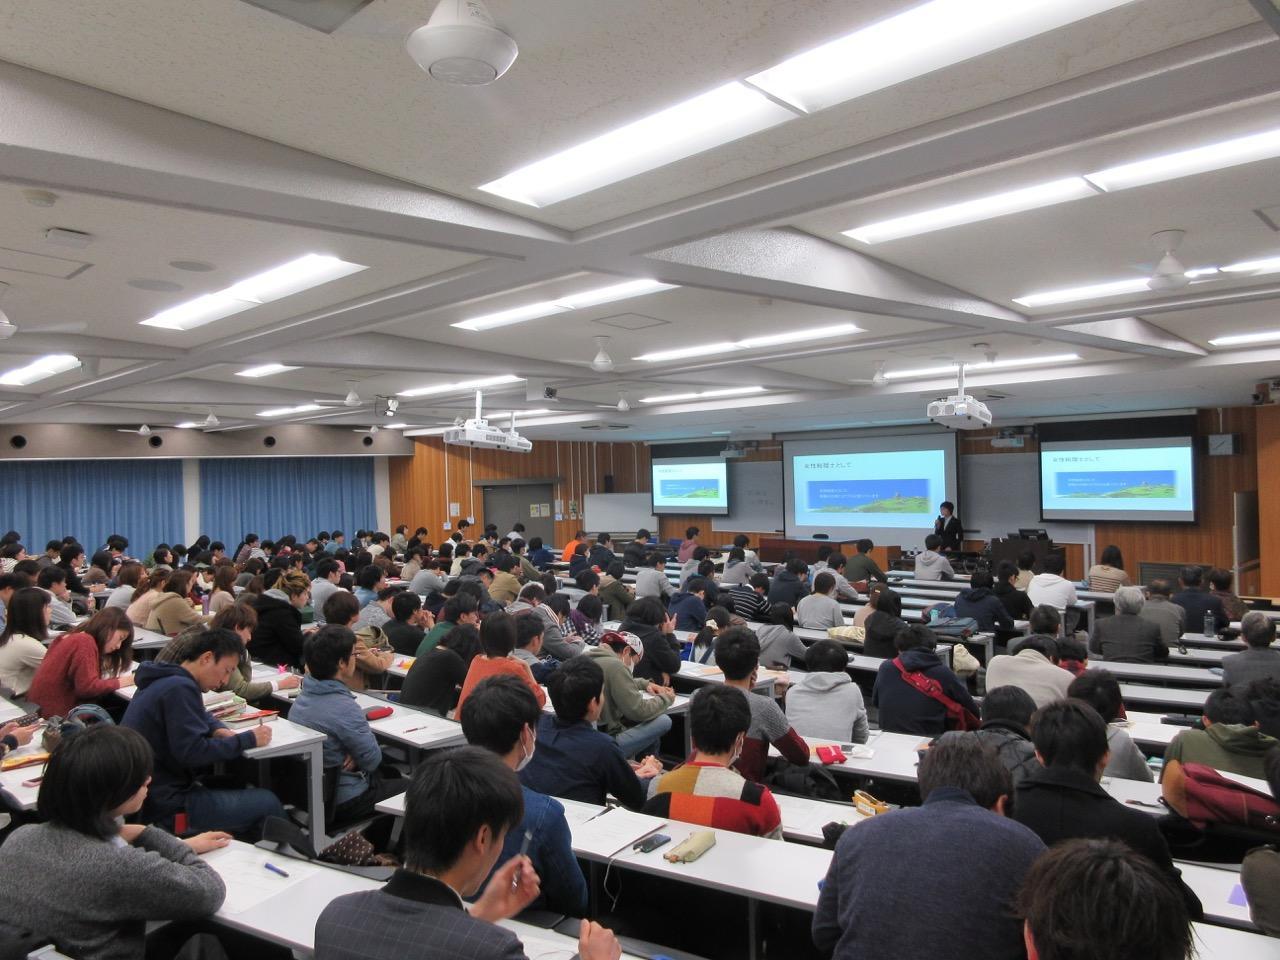 http://www.shinshu-u.ac.jp/faculty/econlaw/topics/th_IMG_1547.jpg